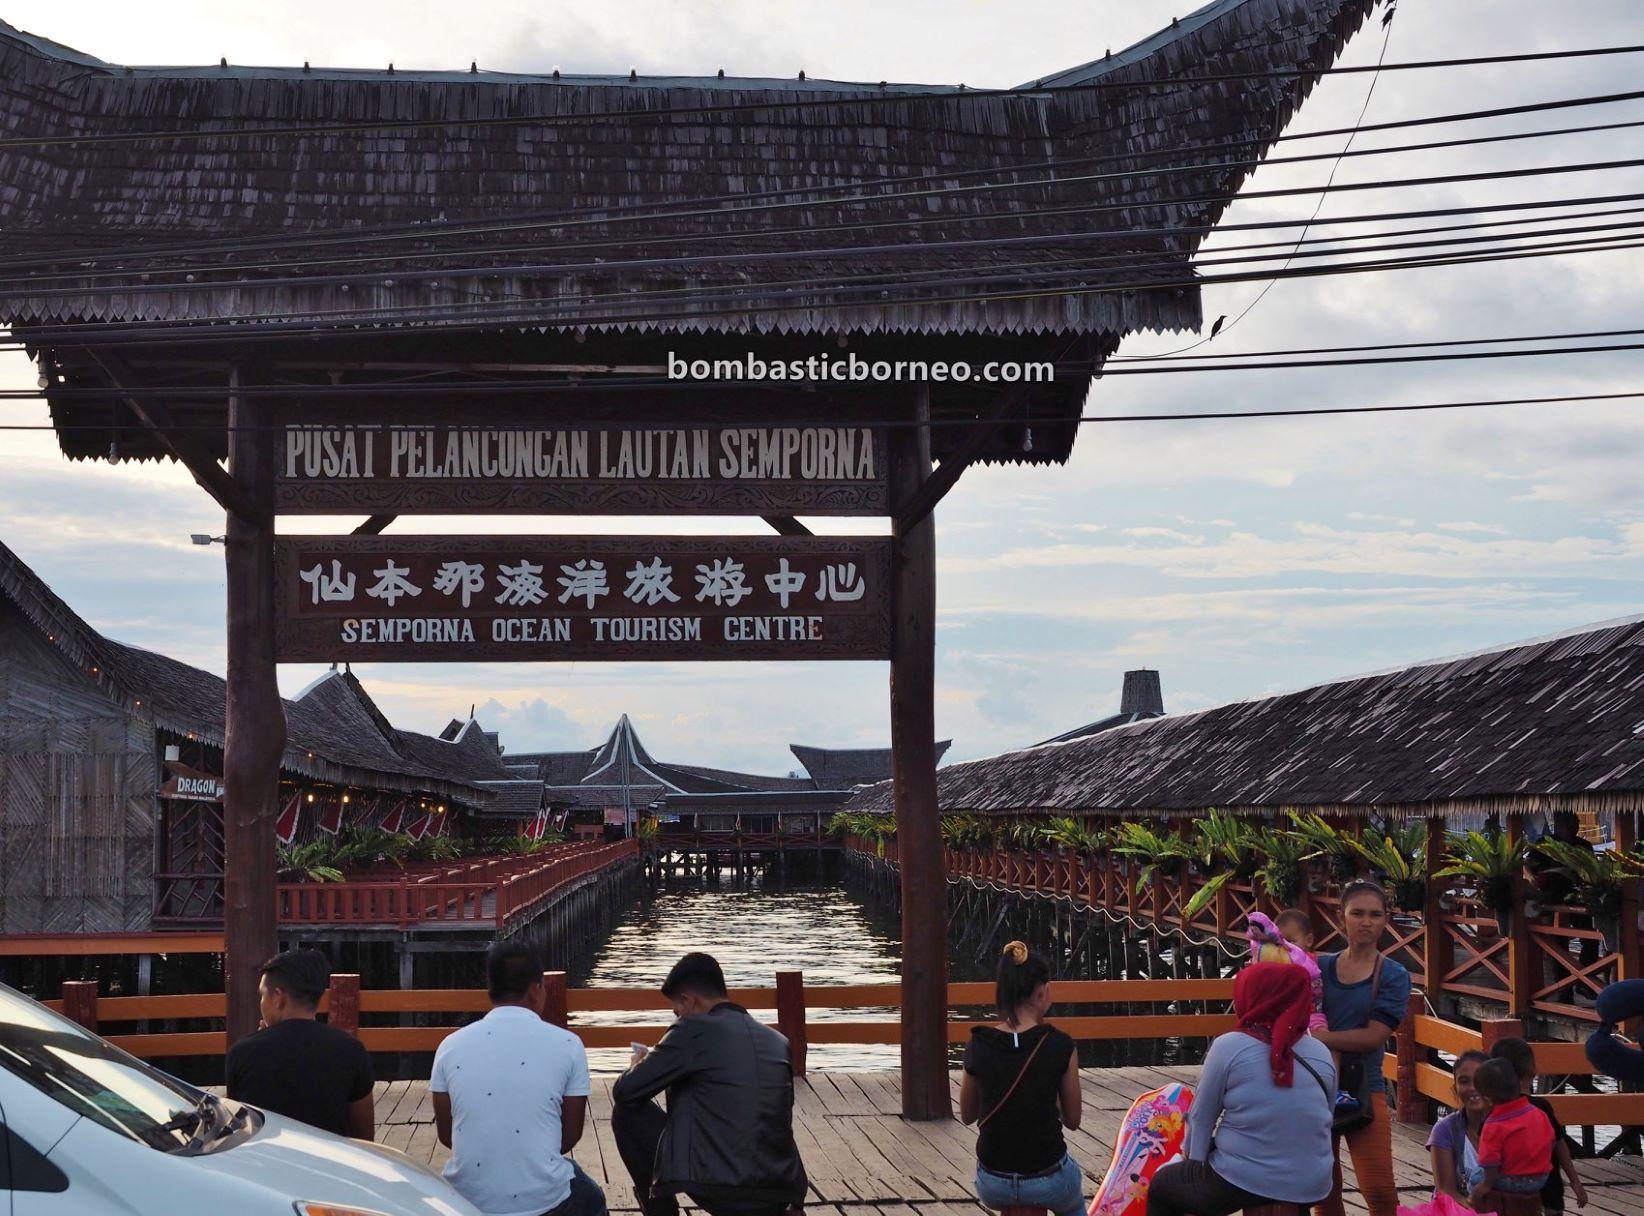 water festival, Pesta Regatta Lepa, backpackers, destination, nature, island, Tawau, tourist attraction, Trans Border, Borneo, 跨境婆罗洲游踪, 马来西亚沙巴, 仙本那旅游景点